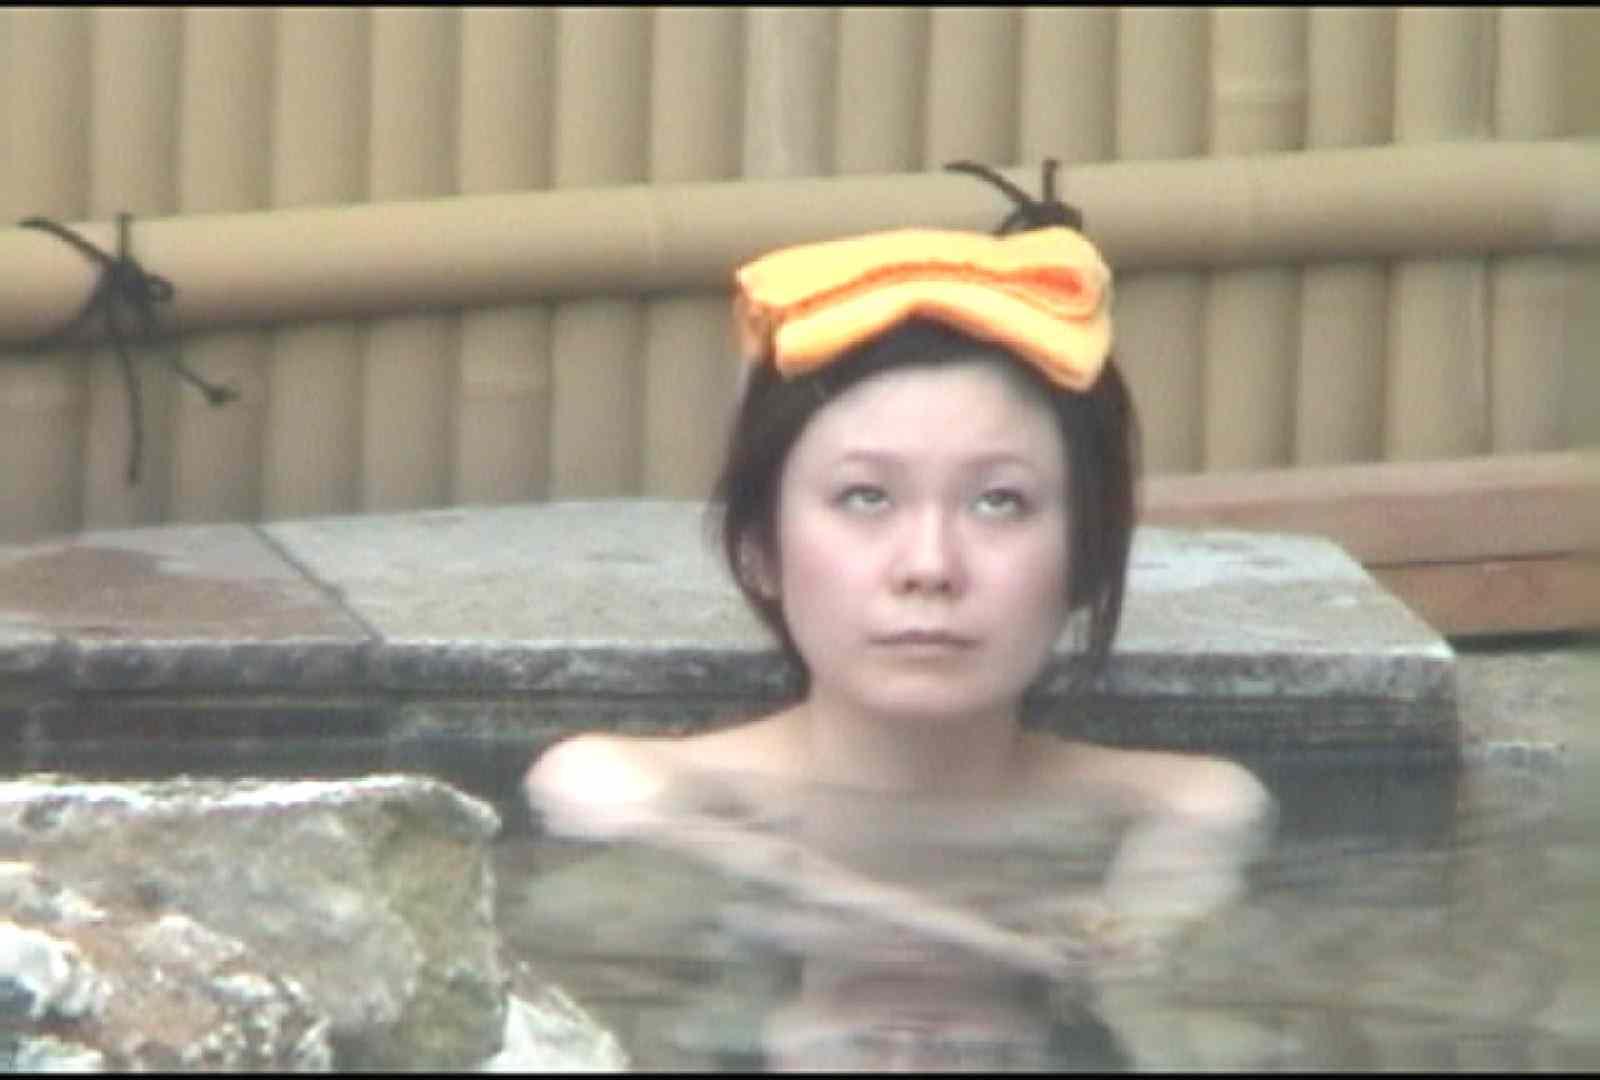 Aquaな露天風呂Vol.177 盗撮師作品  102pic 57